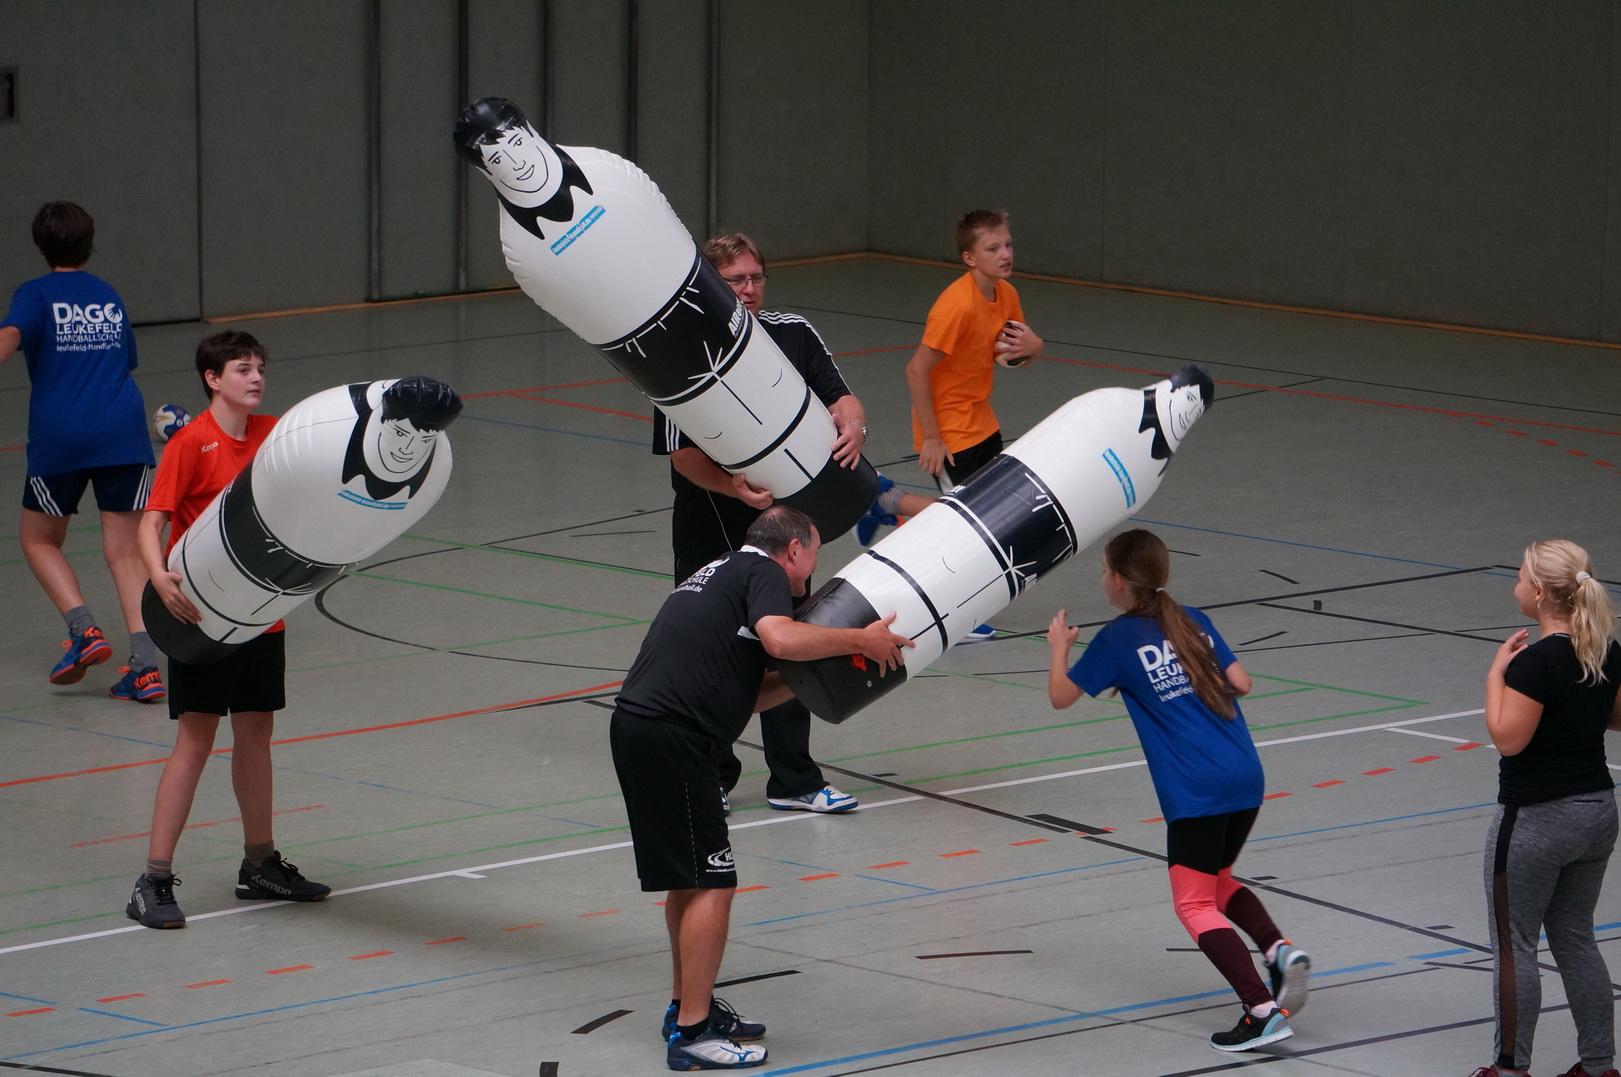 201808_Handballcamp_SDH_MG_265w